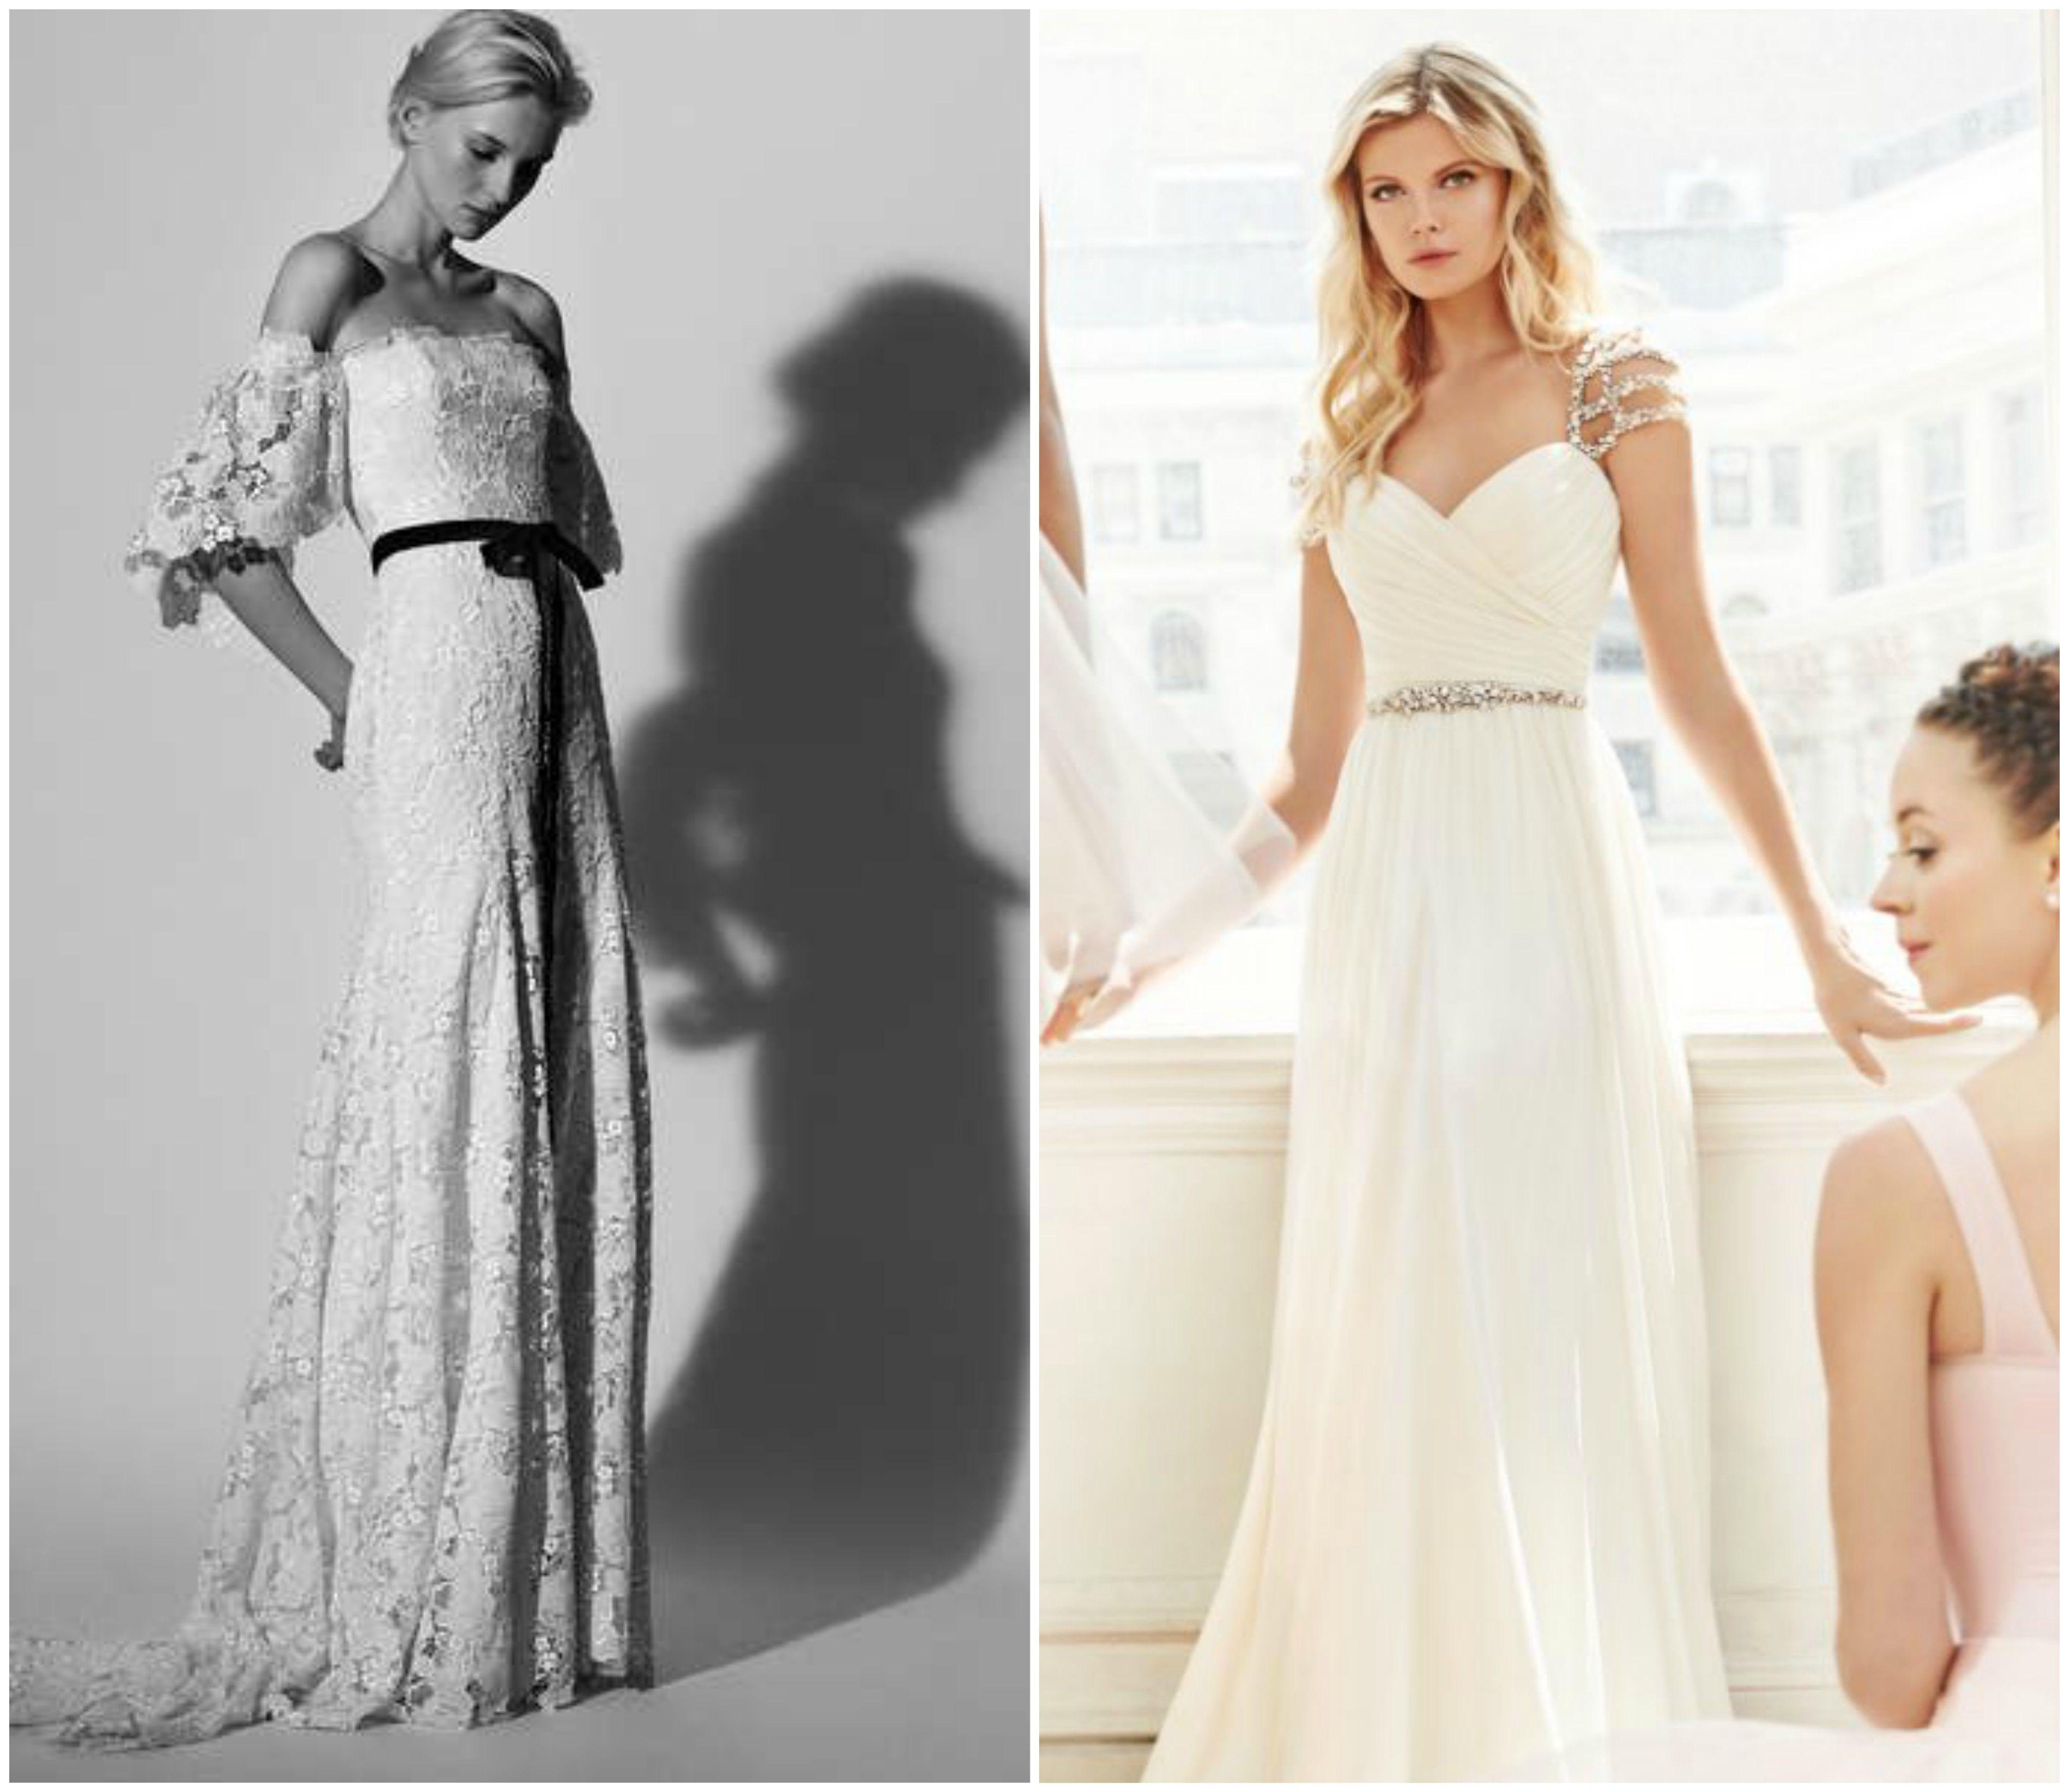 Cintos para vestido de noiva - como usar?   Pinterest